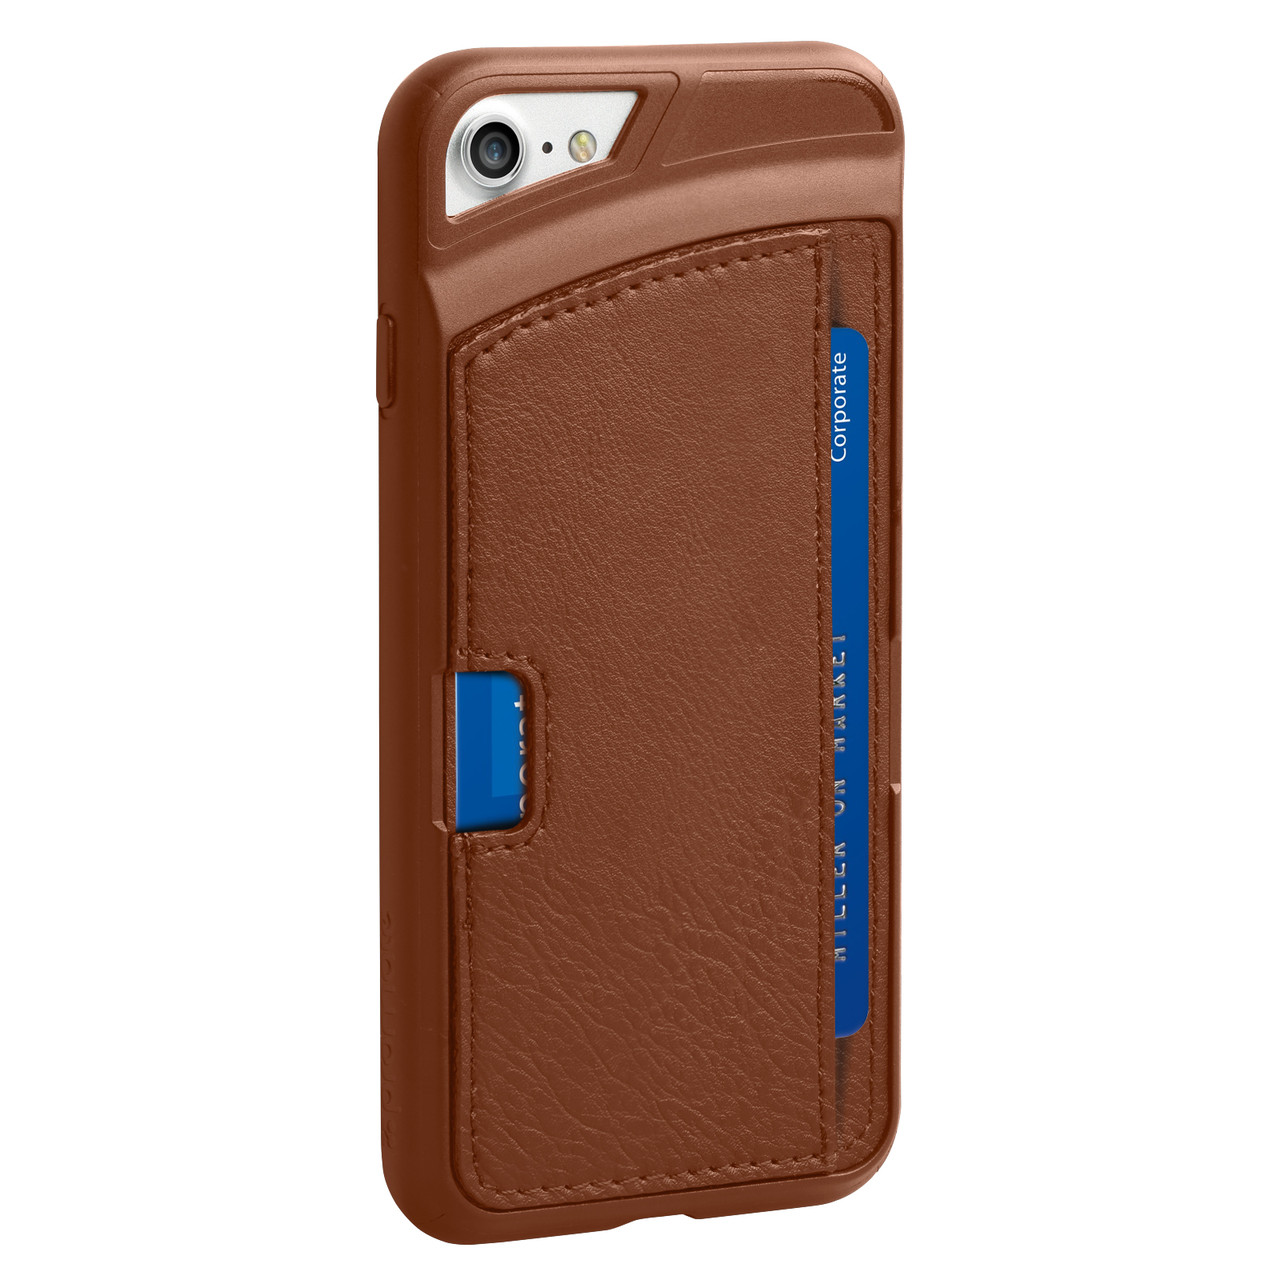 Кожаный защитный чехол для iPhone 7 Promate Wallet-X Brown